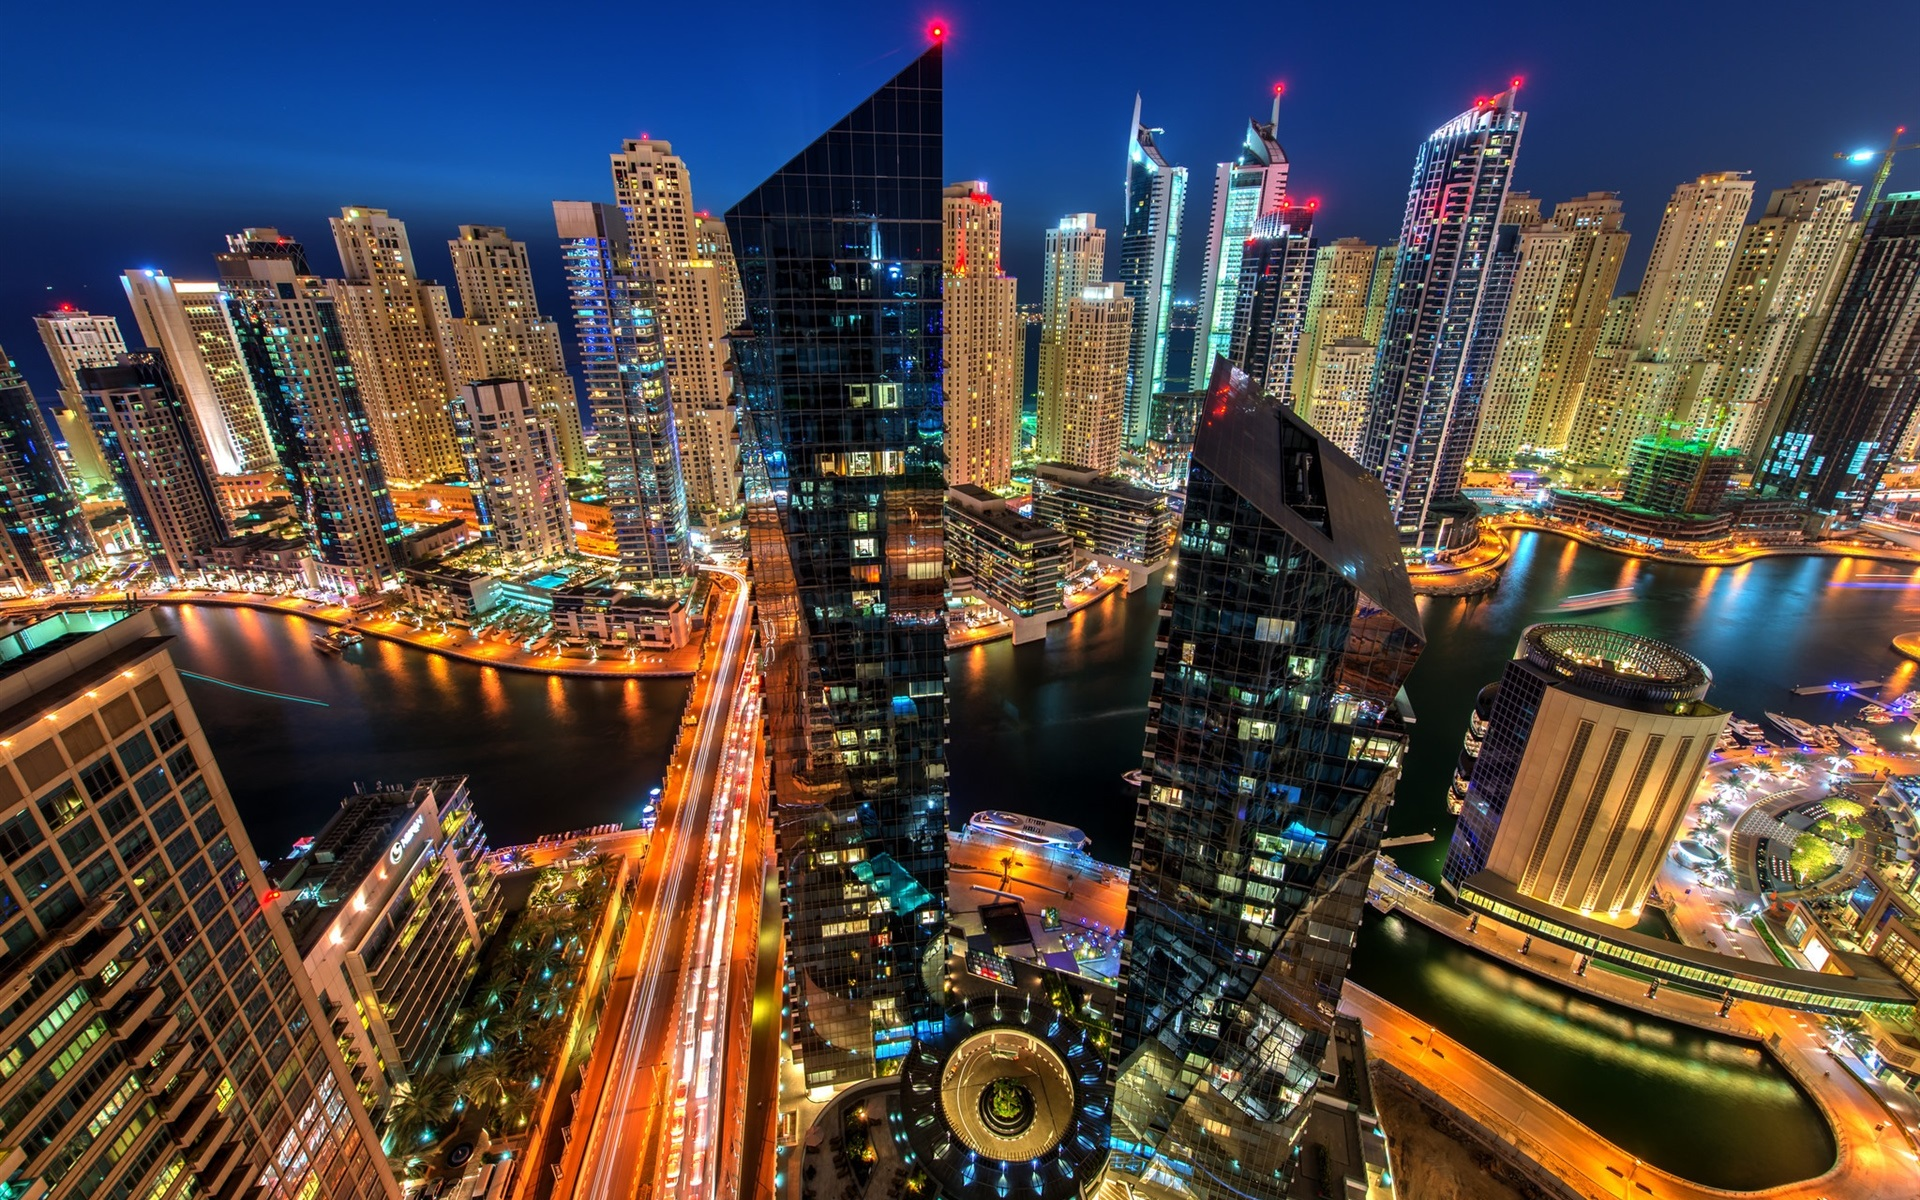 wallpaper dubai marina, dubai, uae, city, evening, buildings